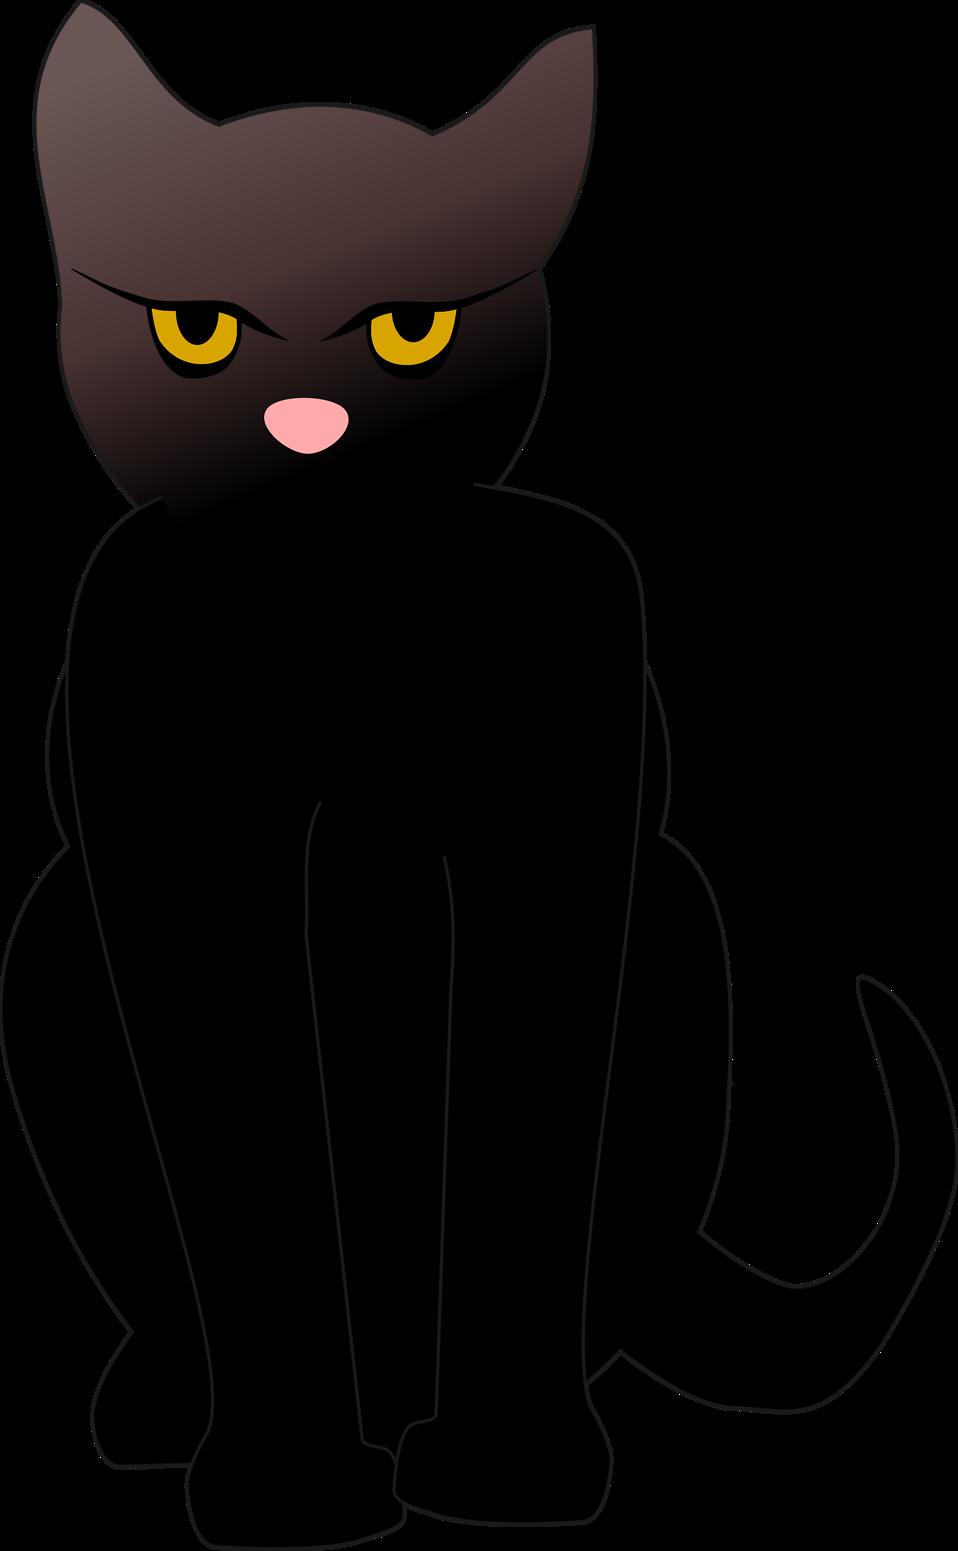 Shapes clipart cat. Free cliparts transparent download